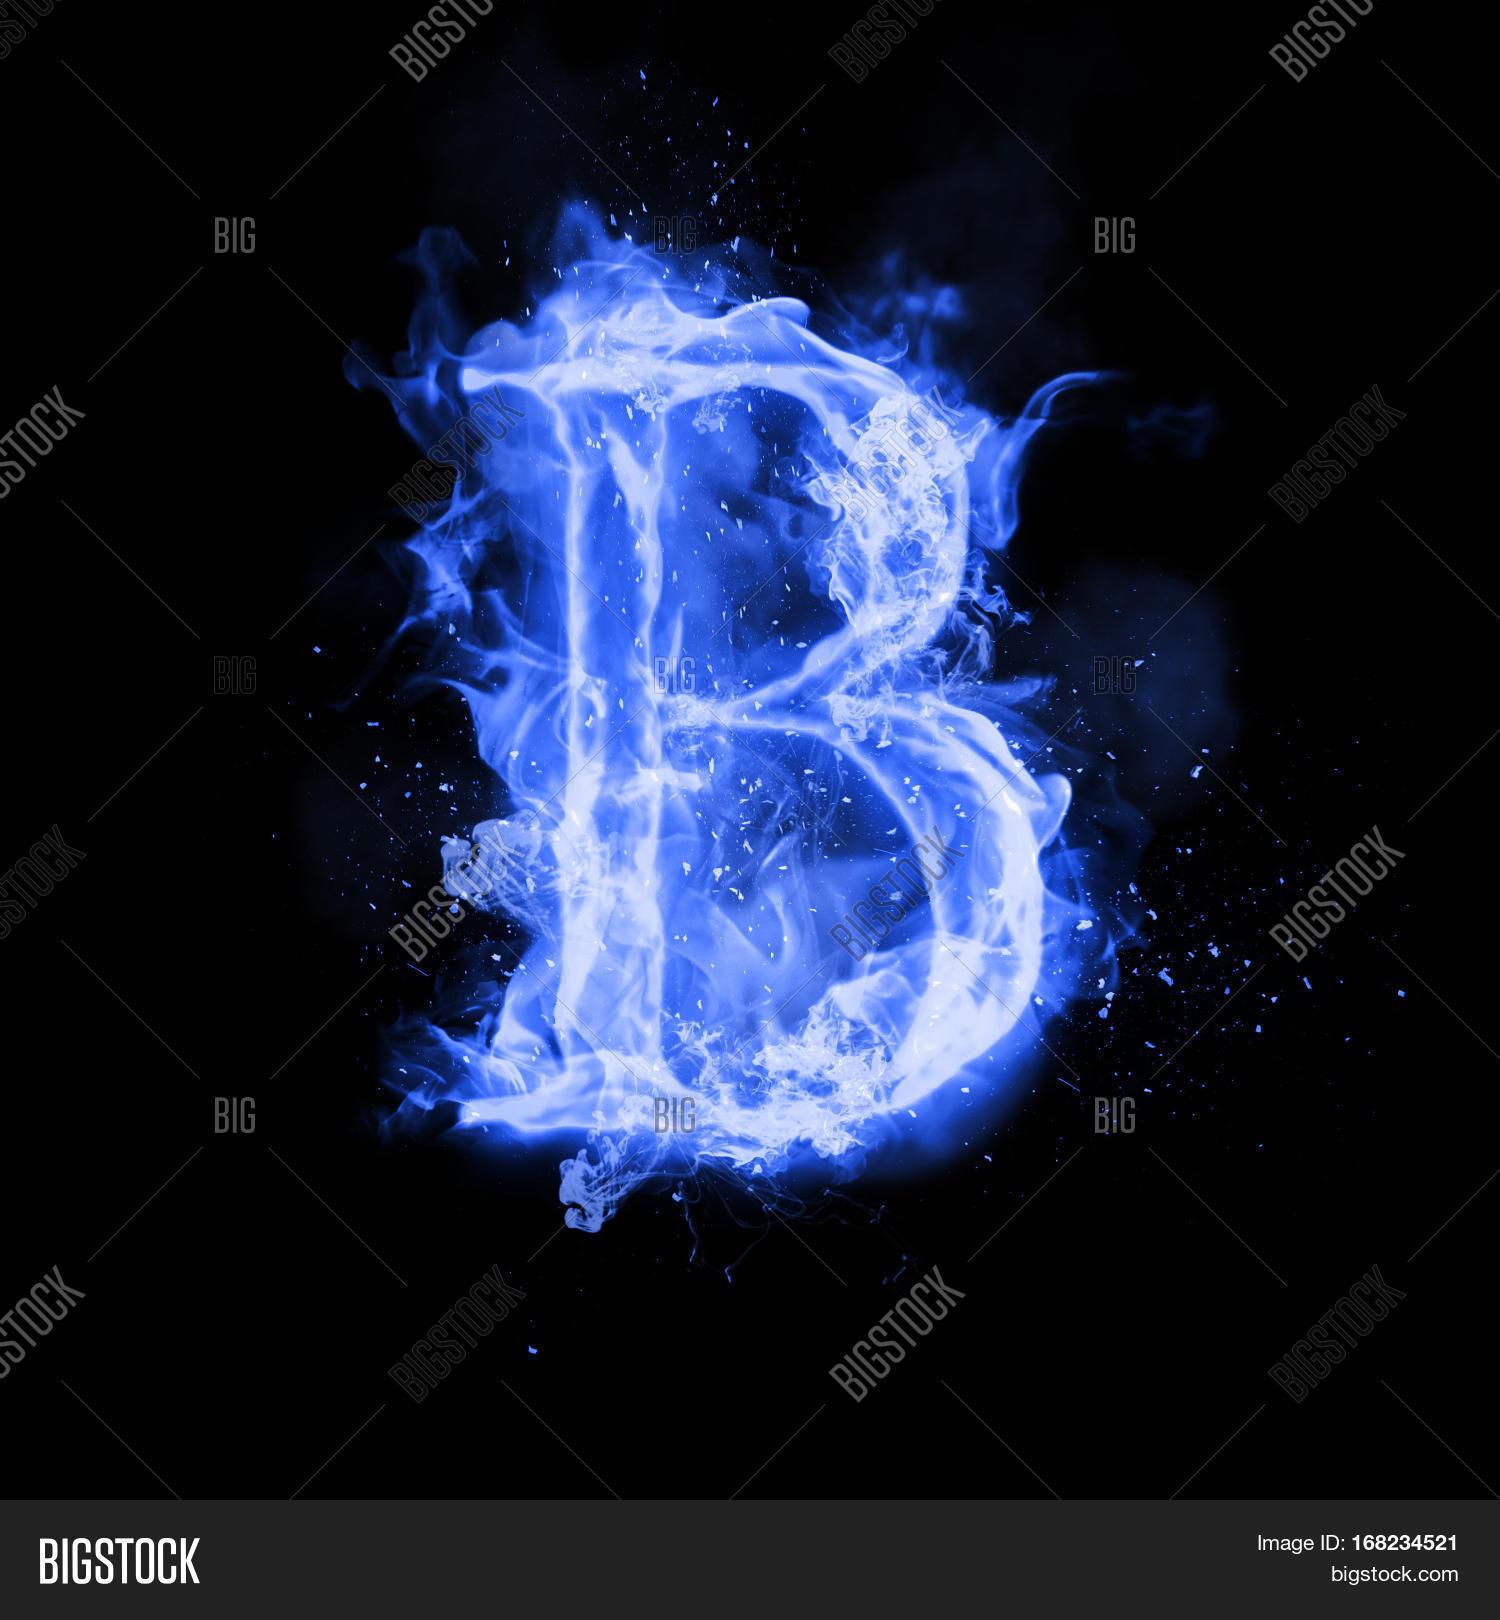 R Letter In Blue Fire Fire Letter B Burning ...